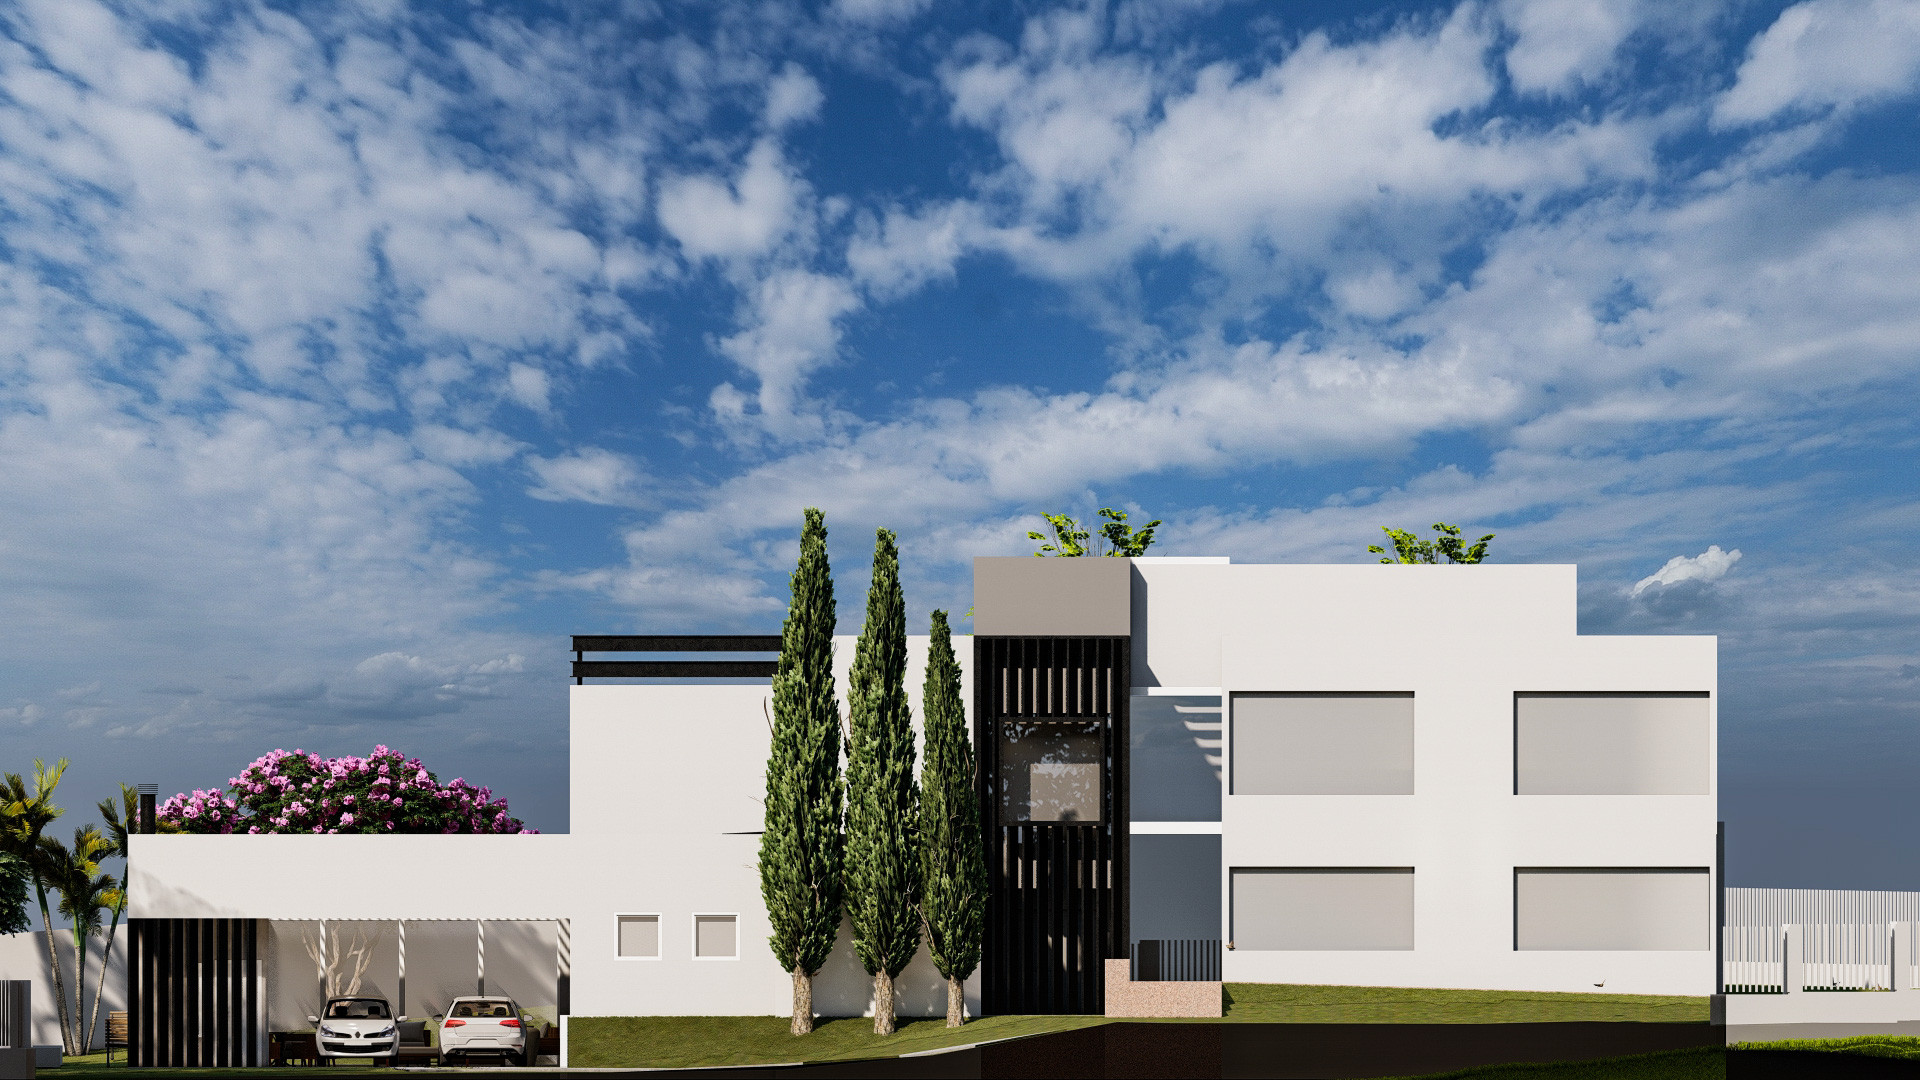 leve_casa novak - numen arquitetura (26)